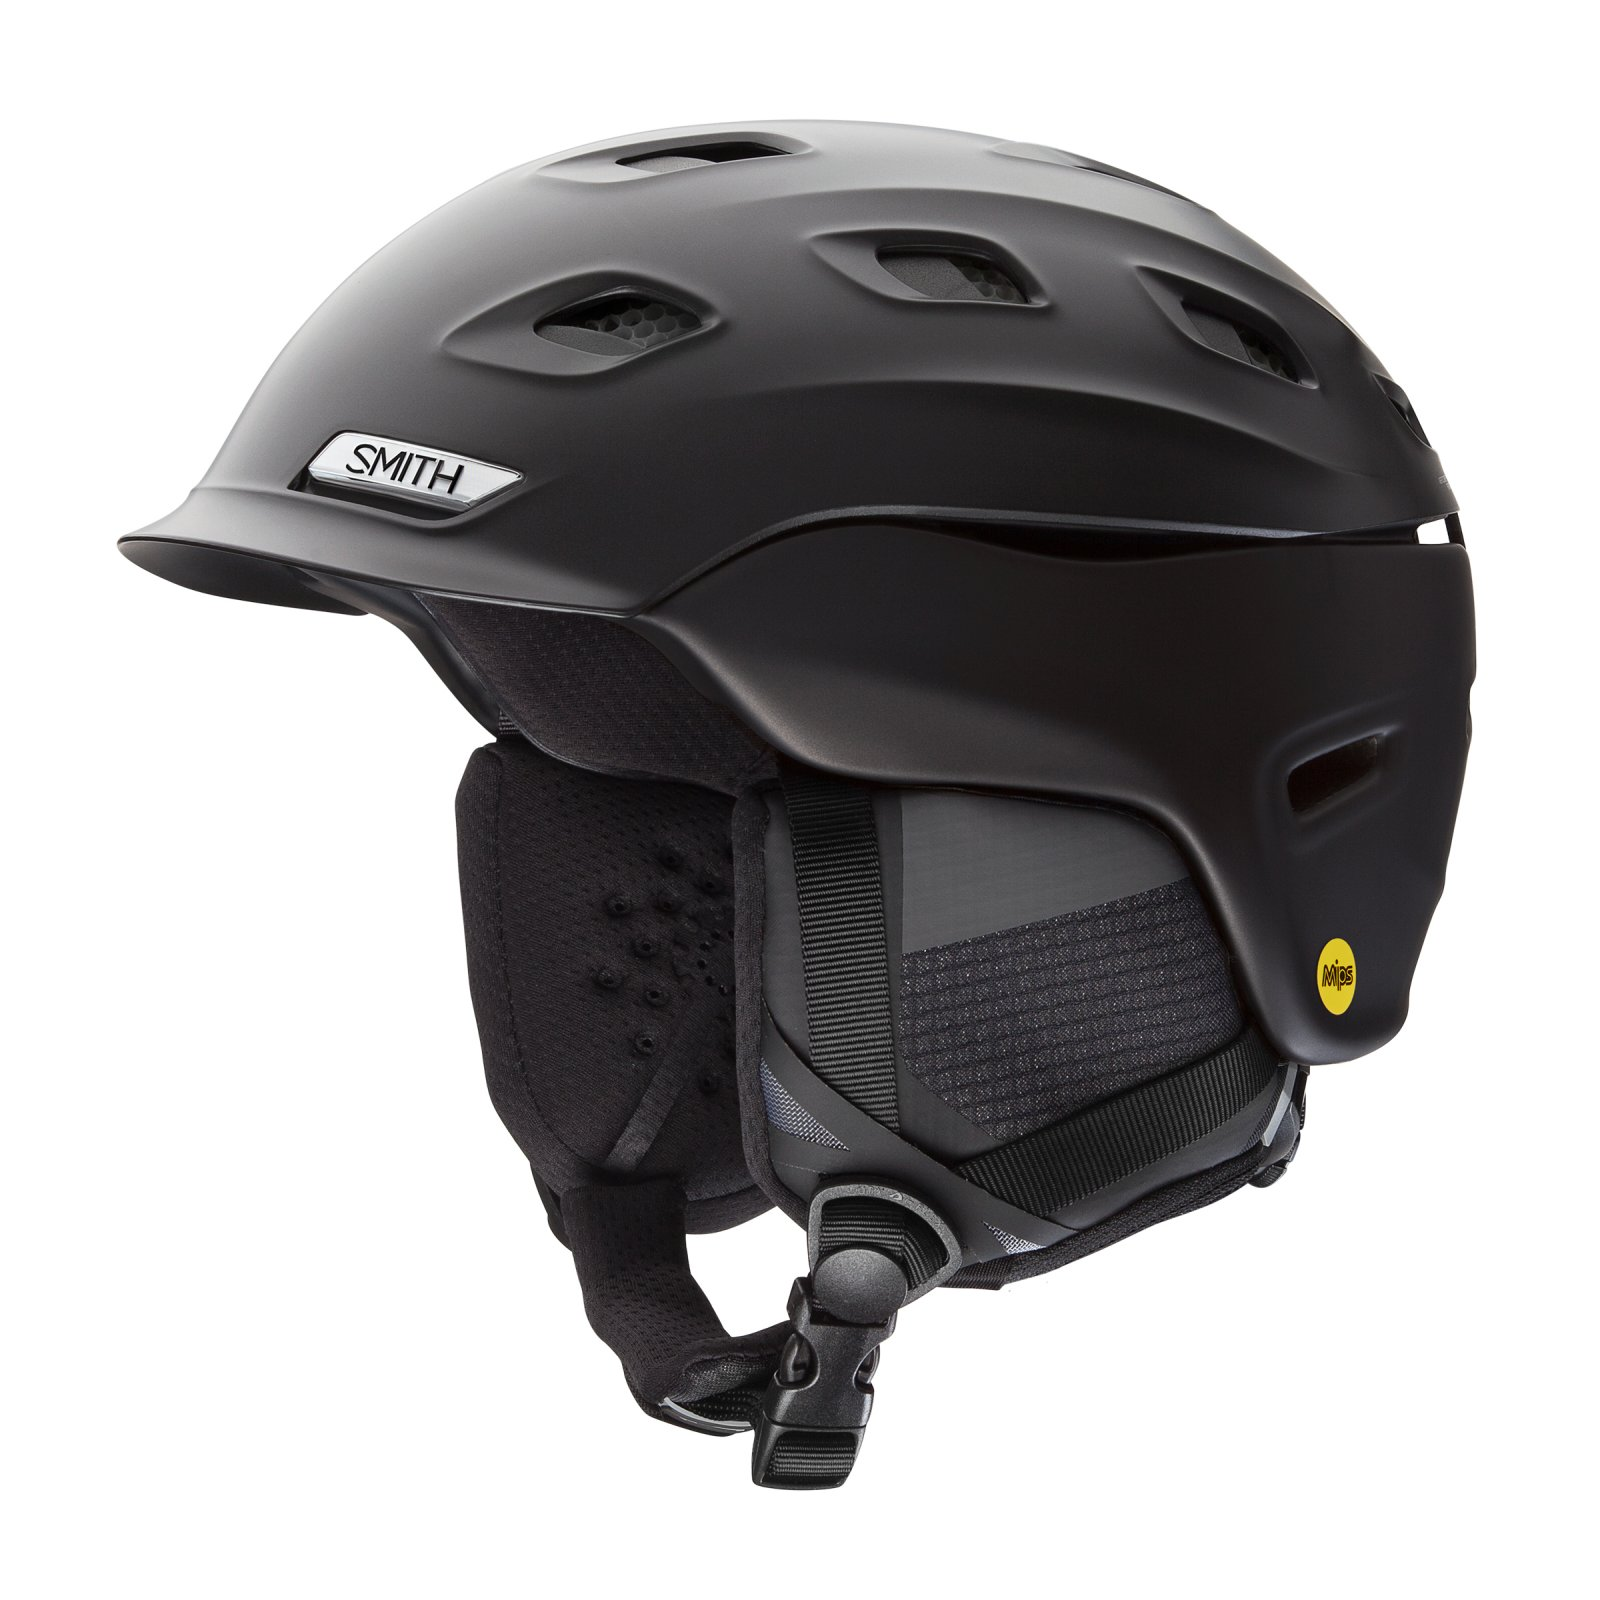 2022 Smith Vantage MIPS Helmet